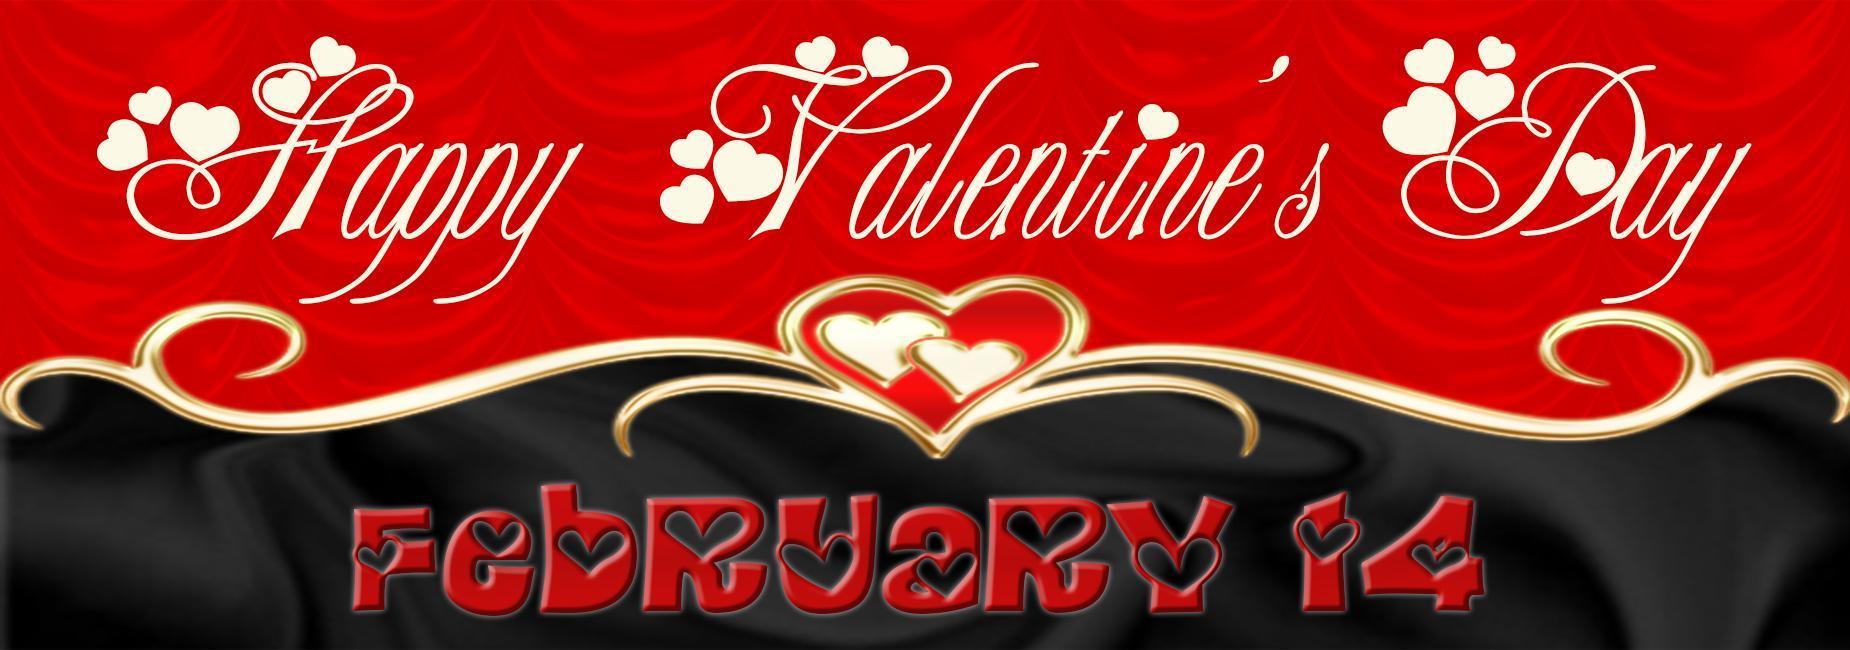 Happy Valentine's Day February 14